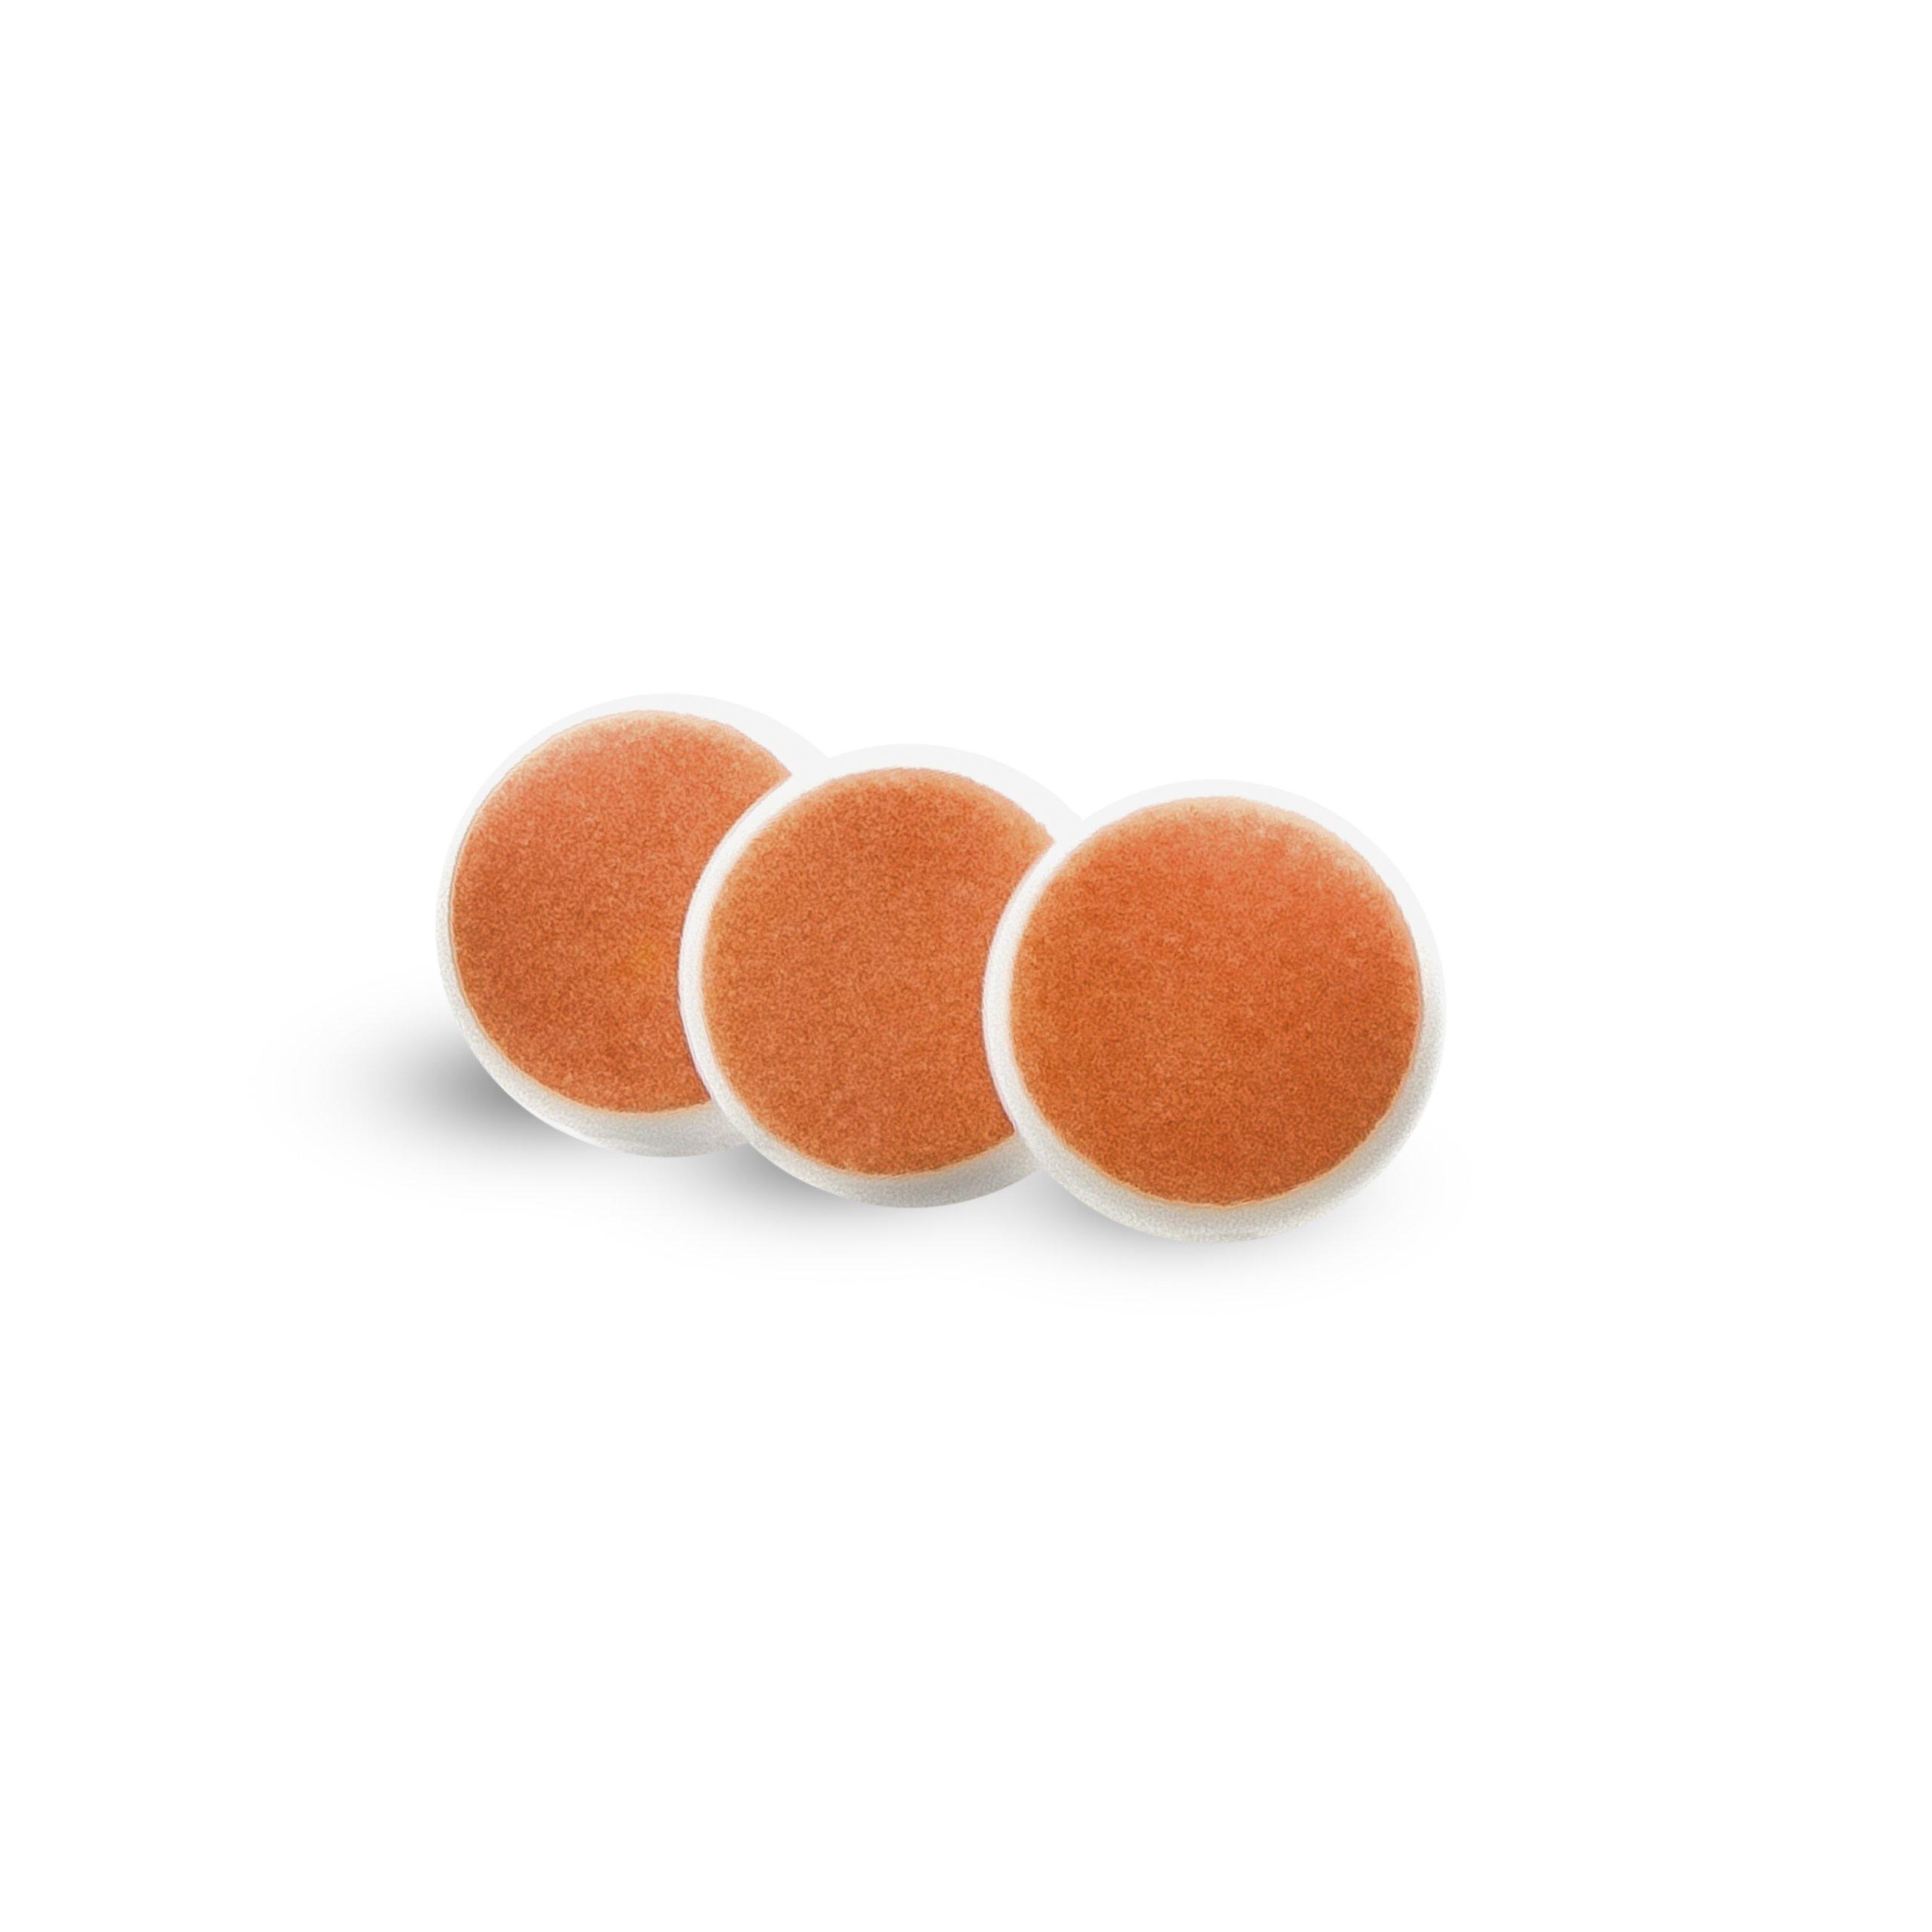 ZoLi BUZZ B replacement pads - Orange (3 per set)